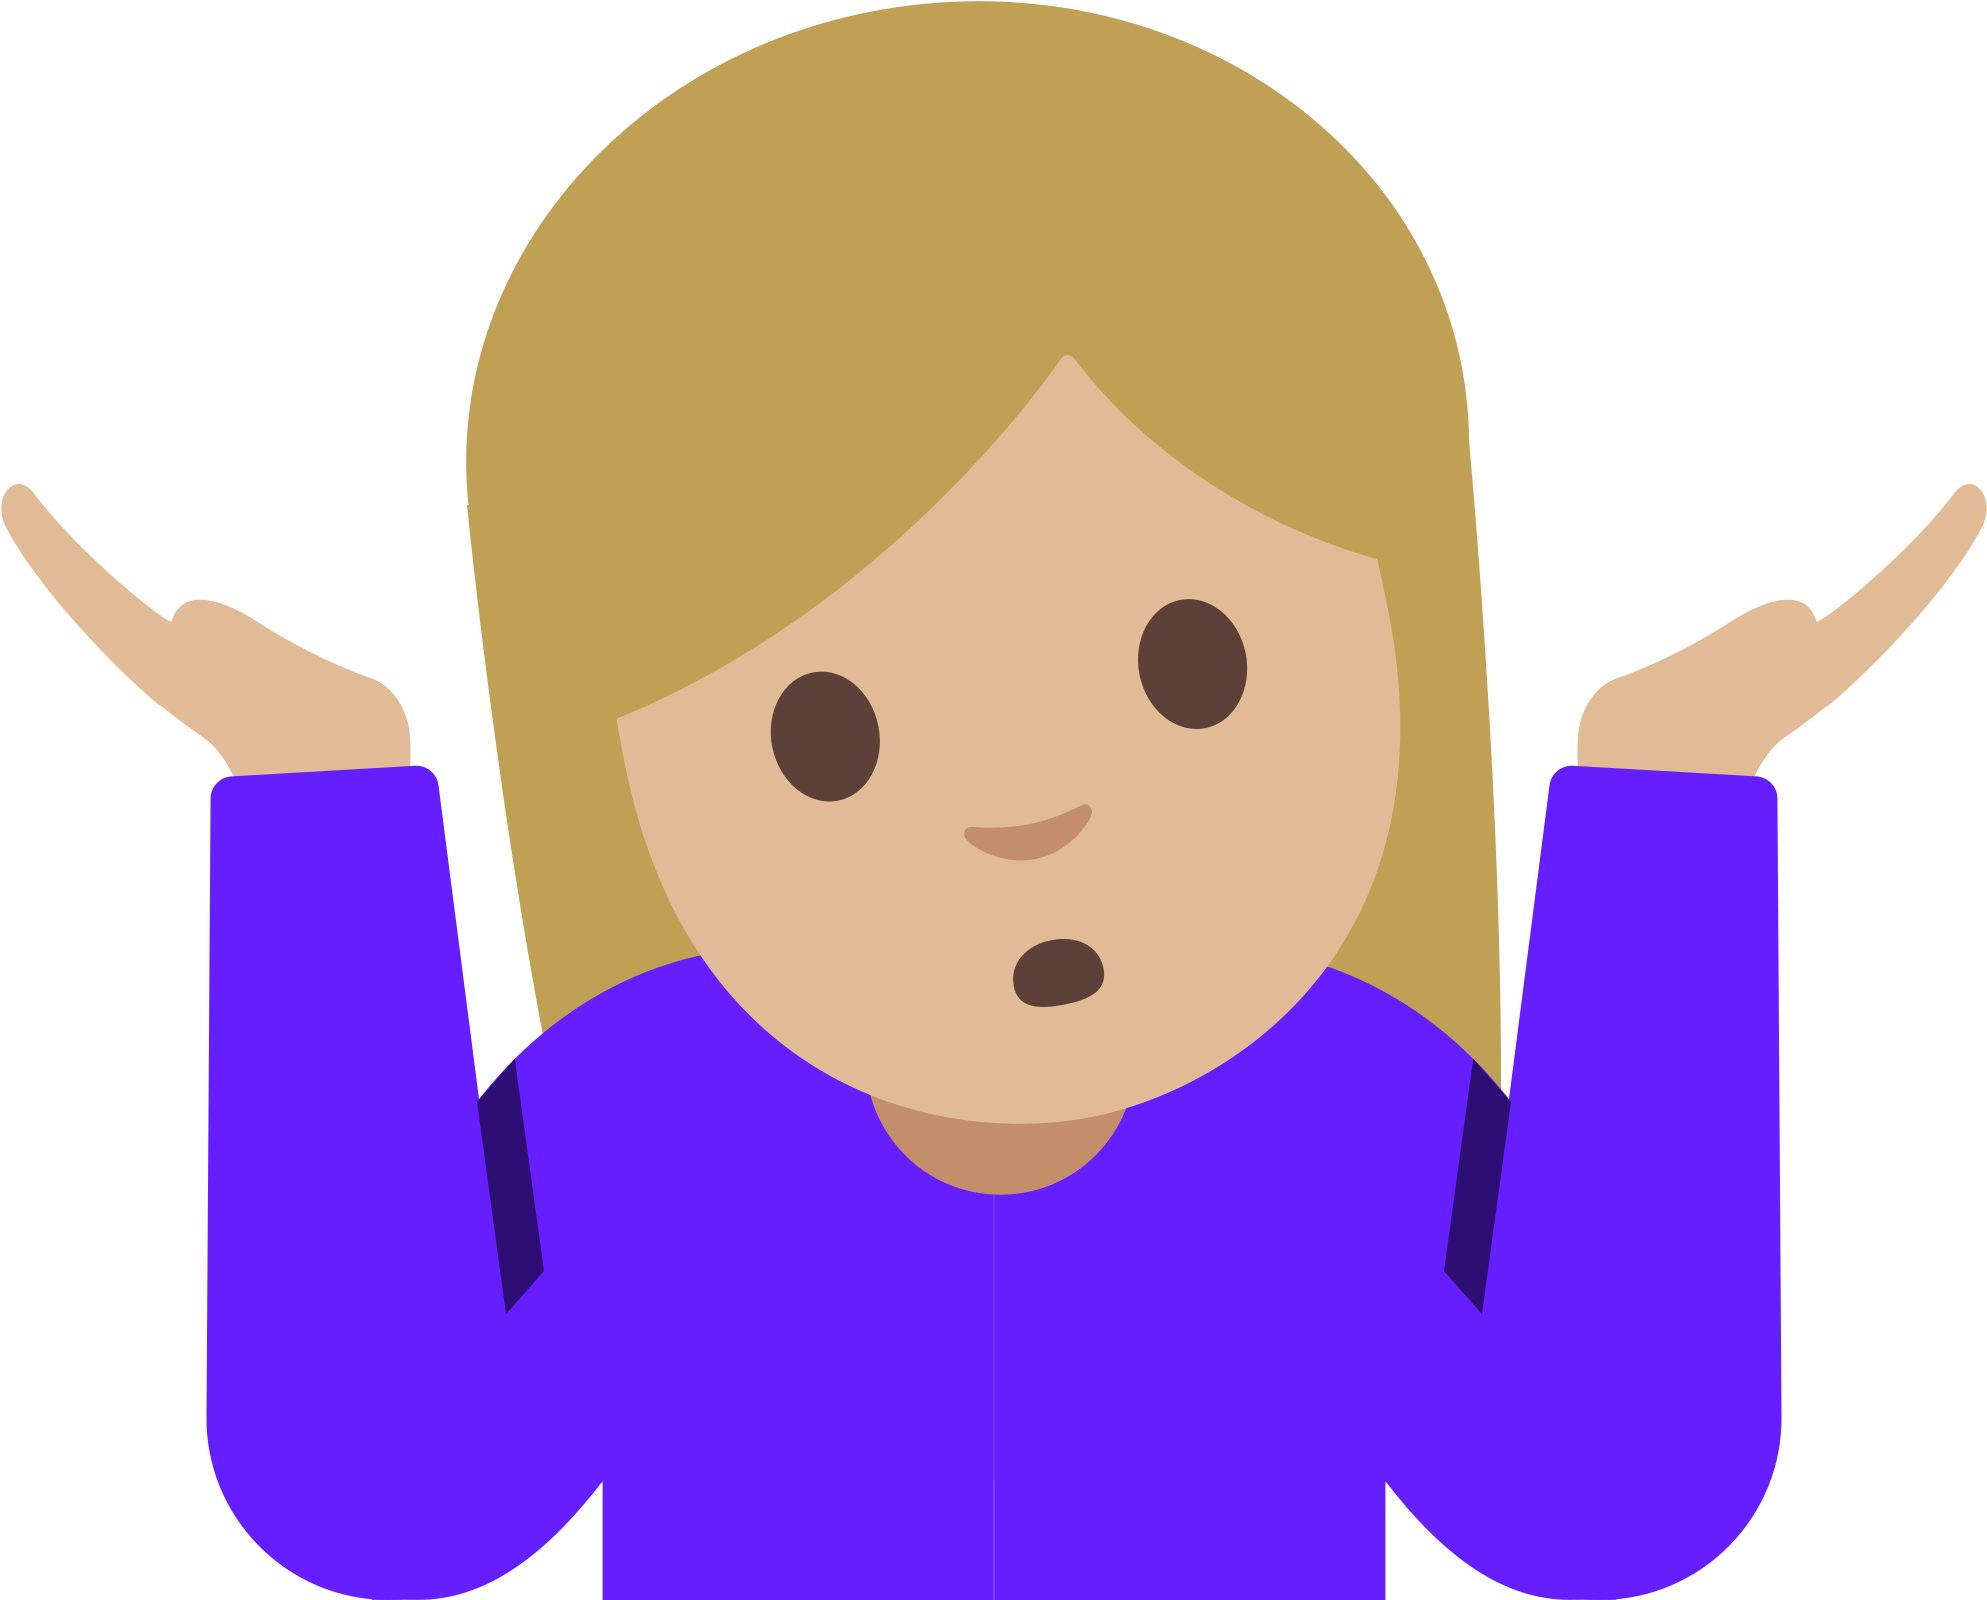 Shrug Emoji Android, HD Png Download.